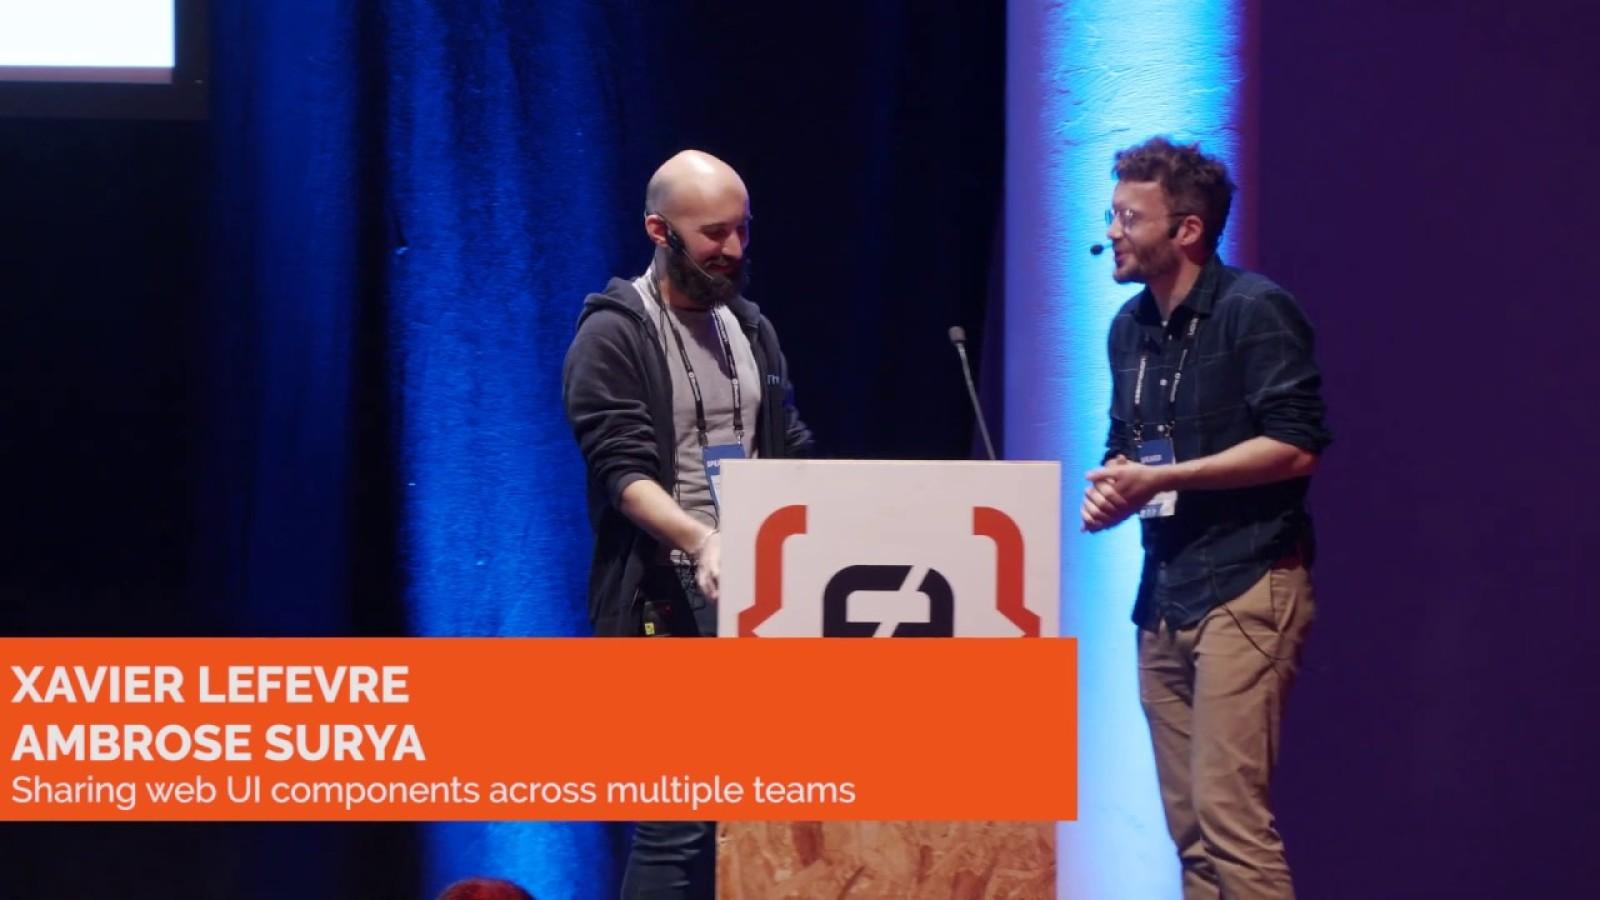 Sharing web UI components across multiple teams